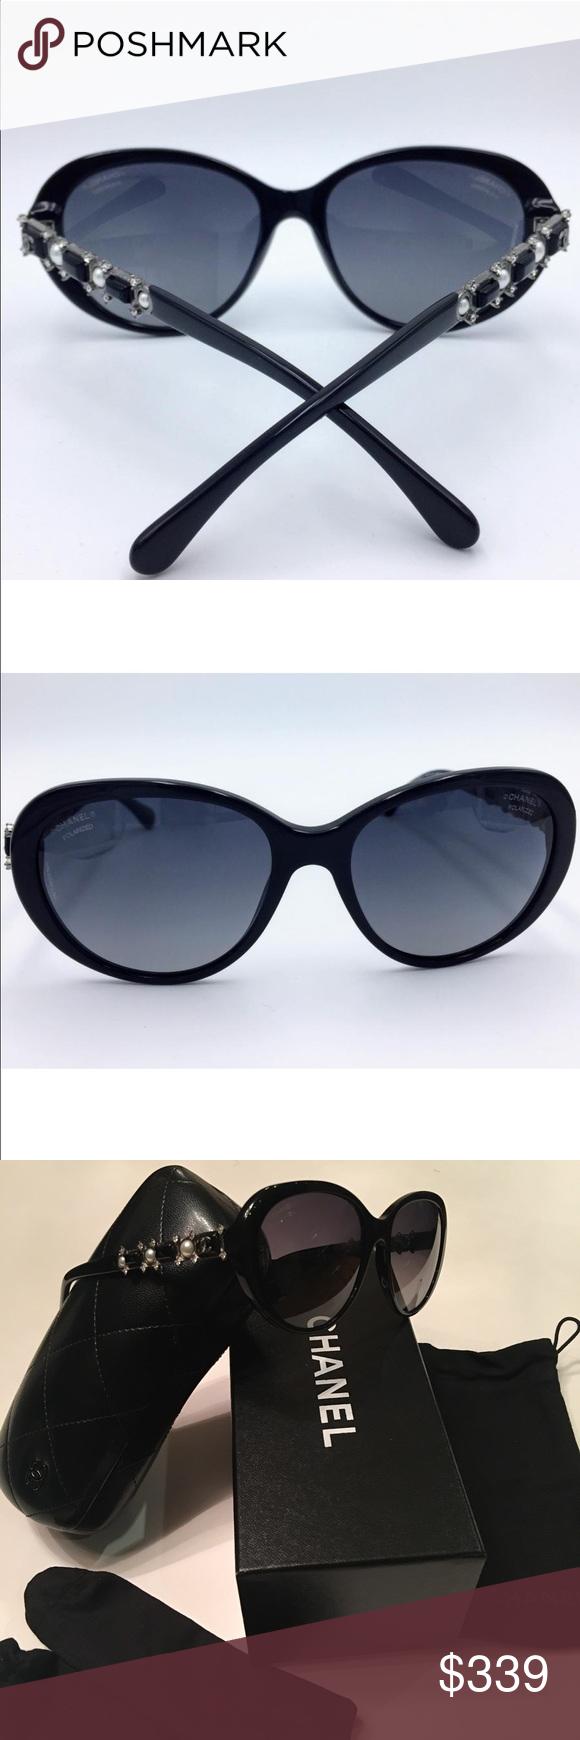 Chanel Bijou sunglasses